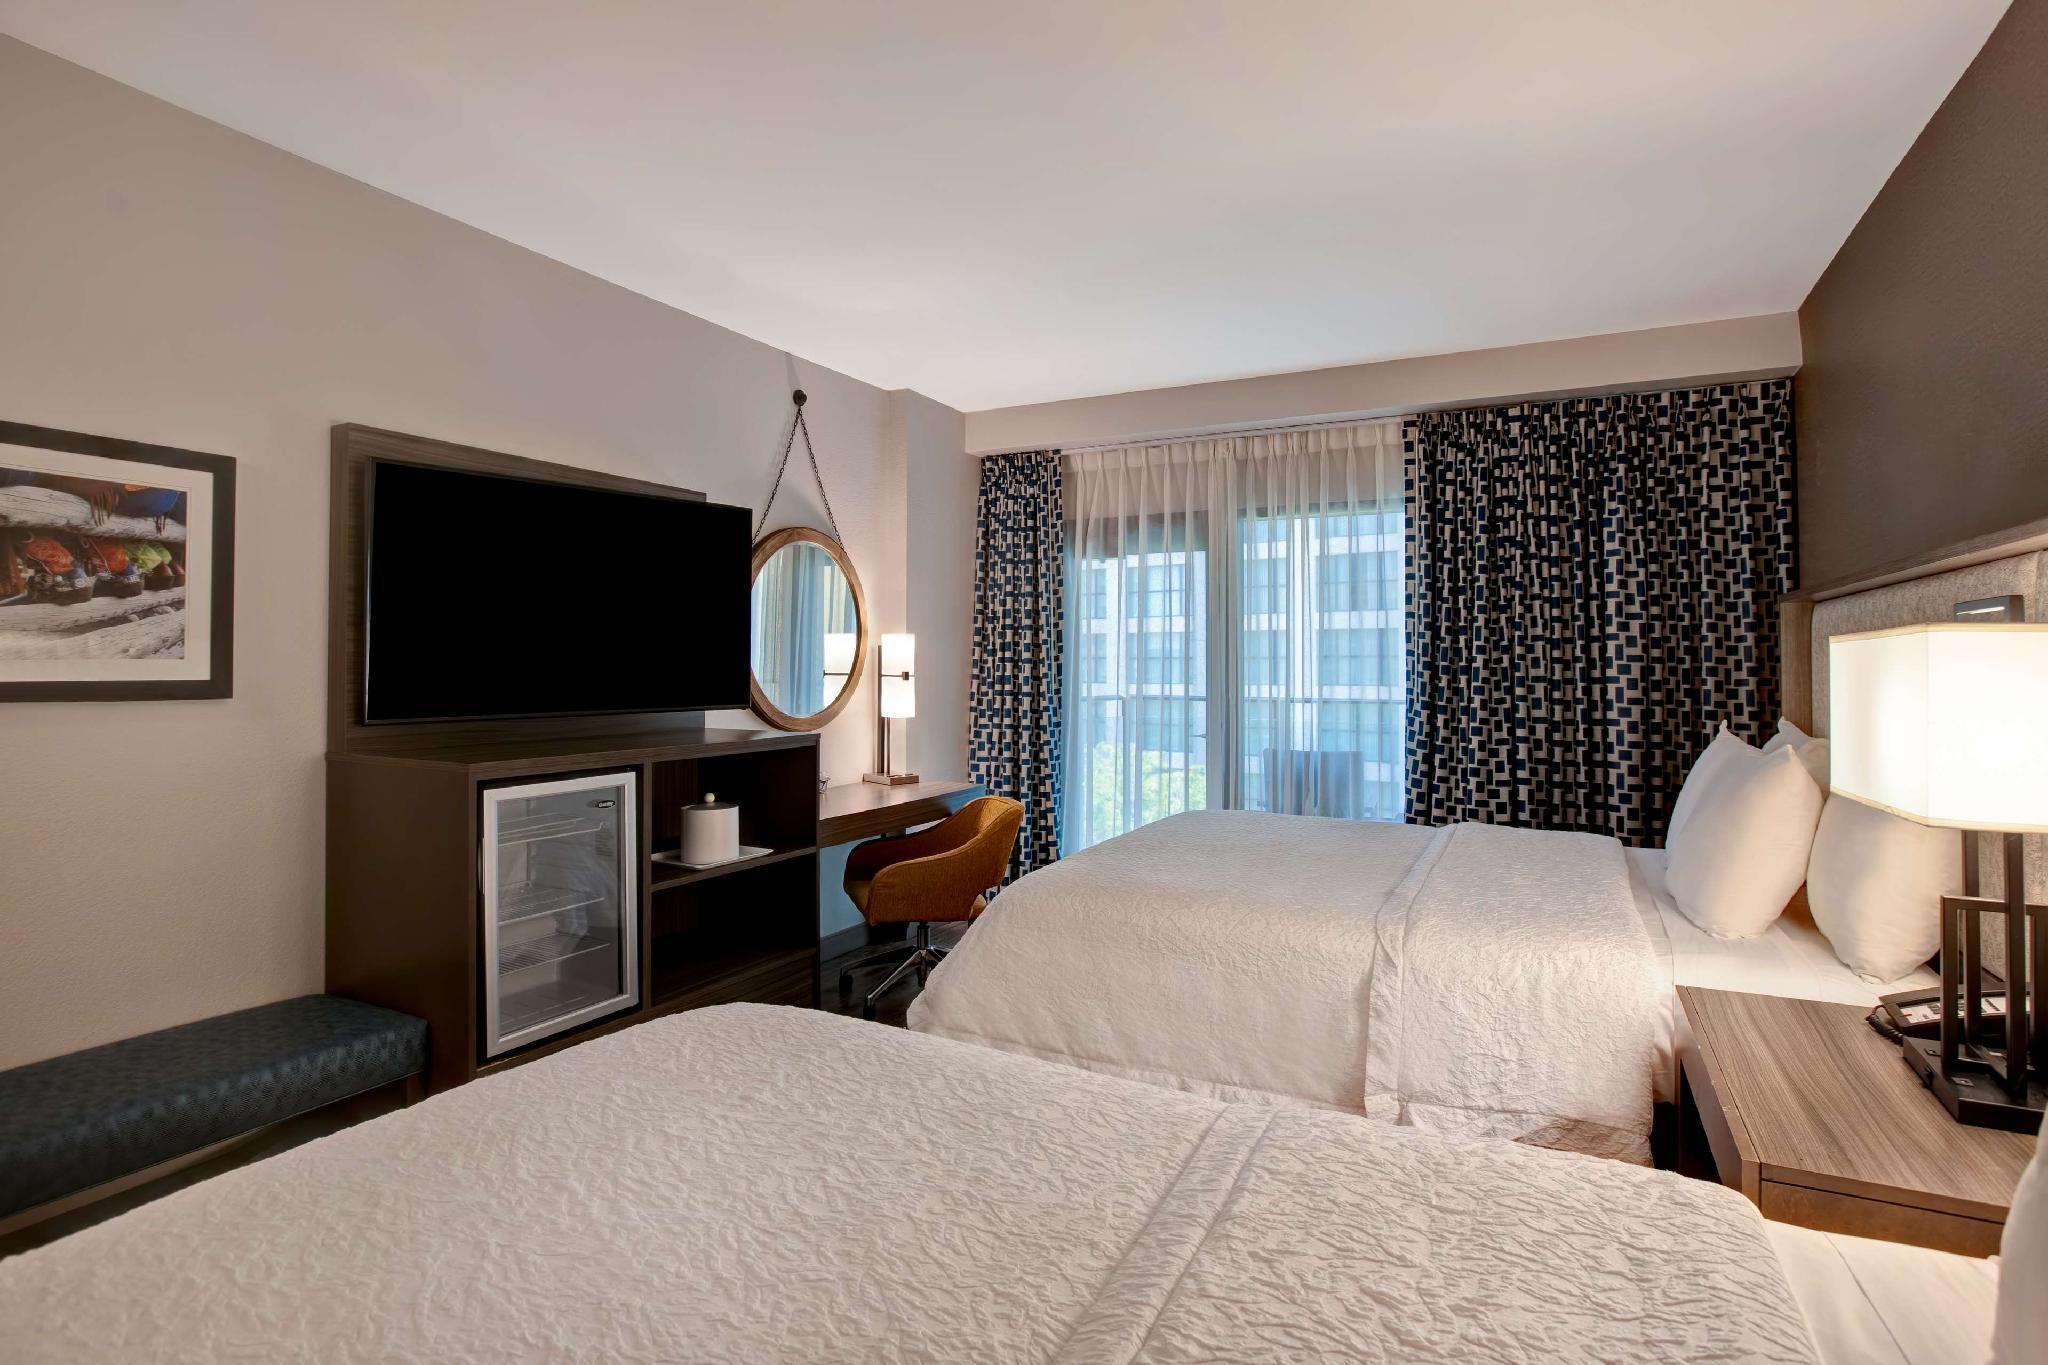 Hampton Inn Suites San Antonio Riverwalk Hotel San Antonio Tx Deals Photos Reviews